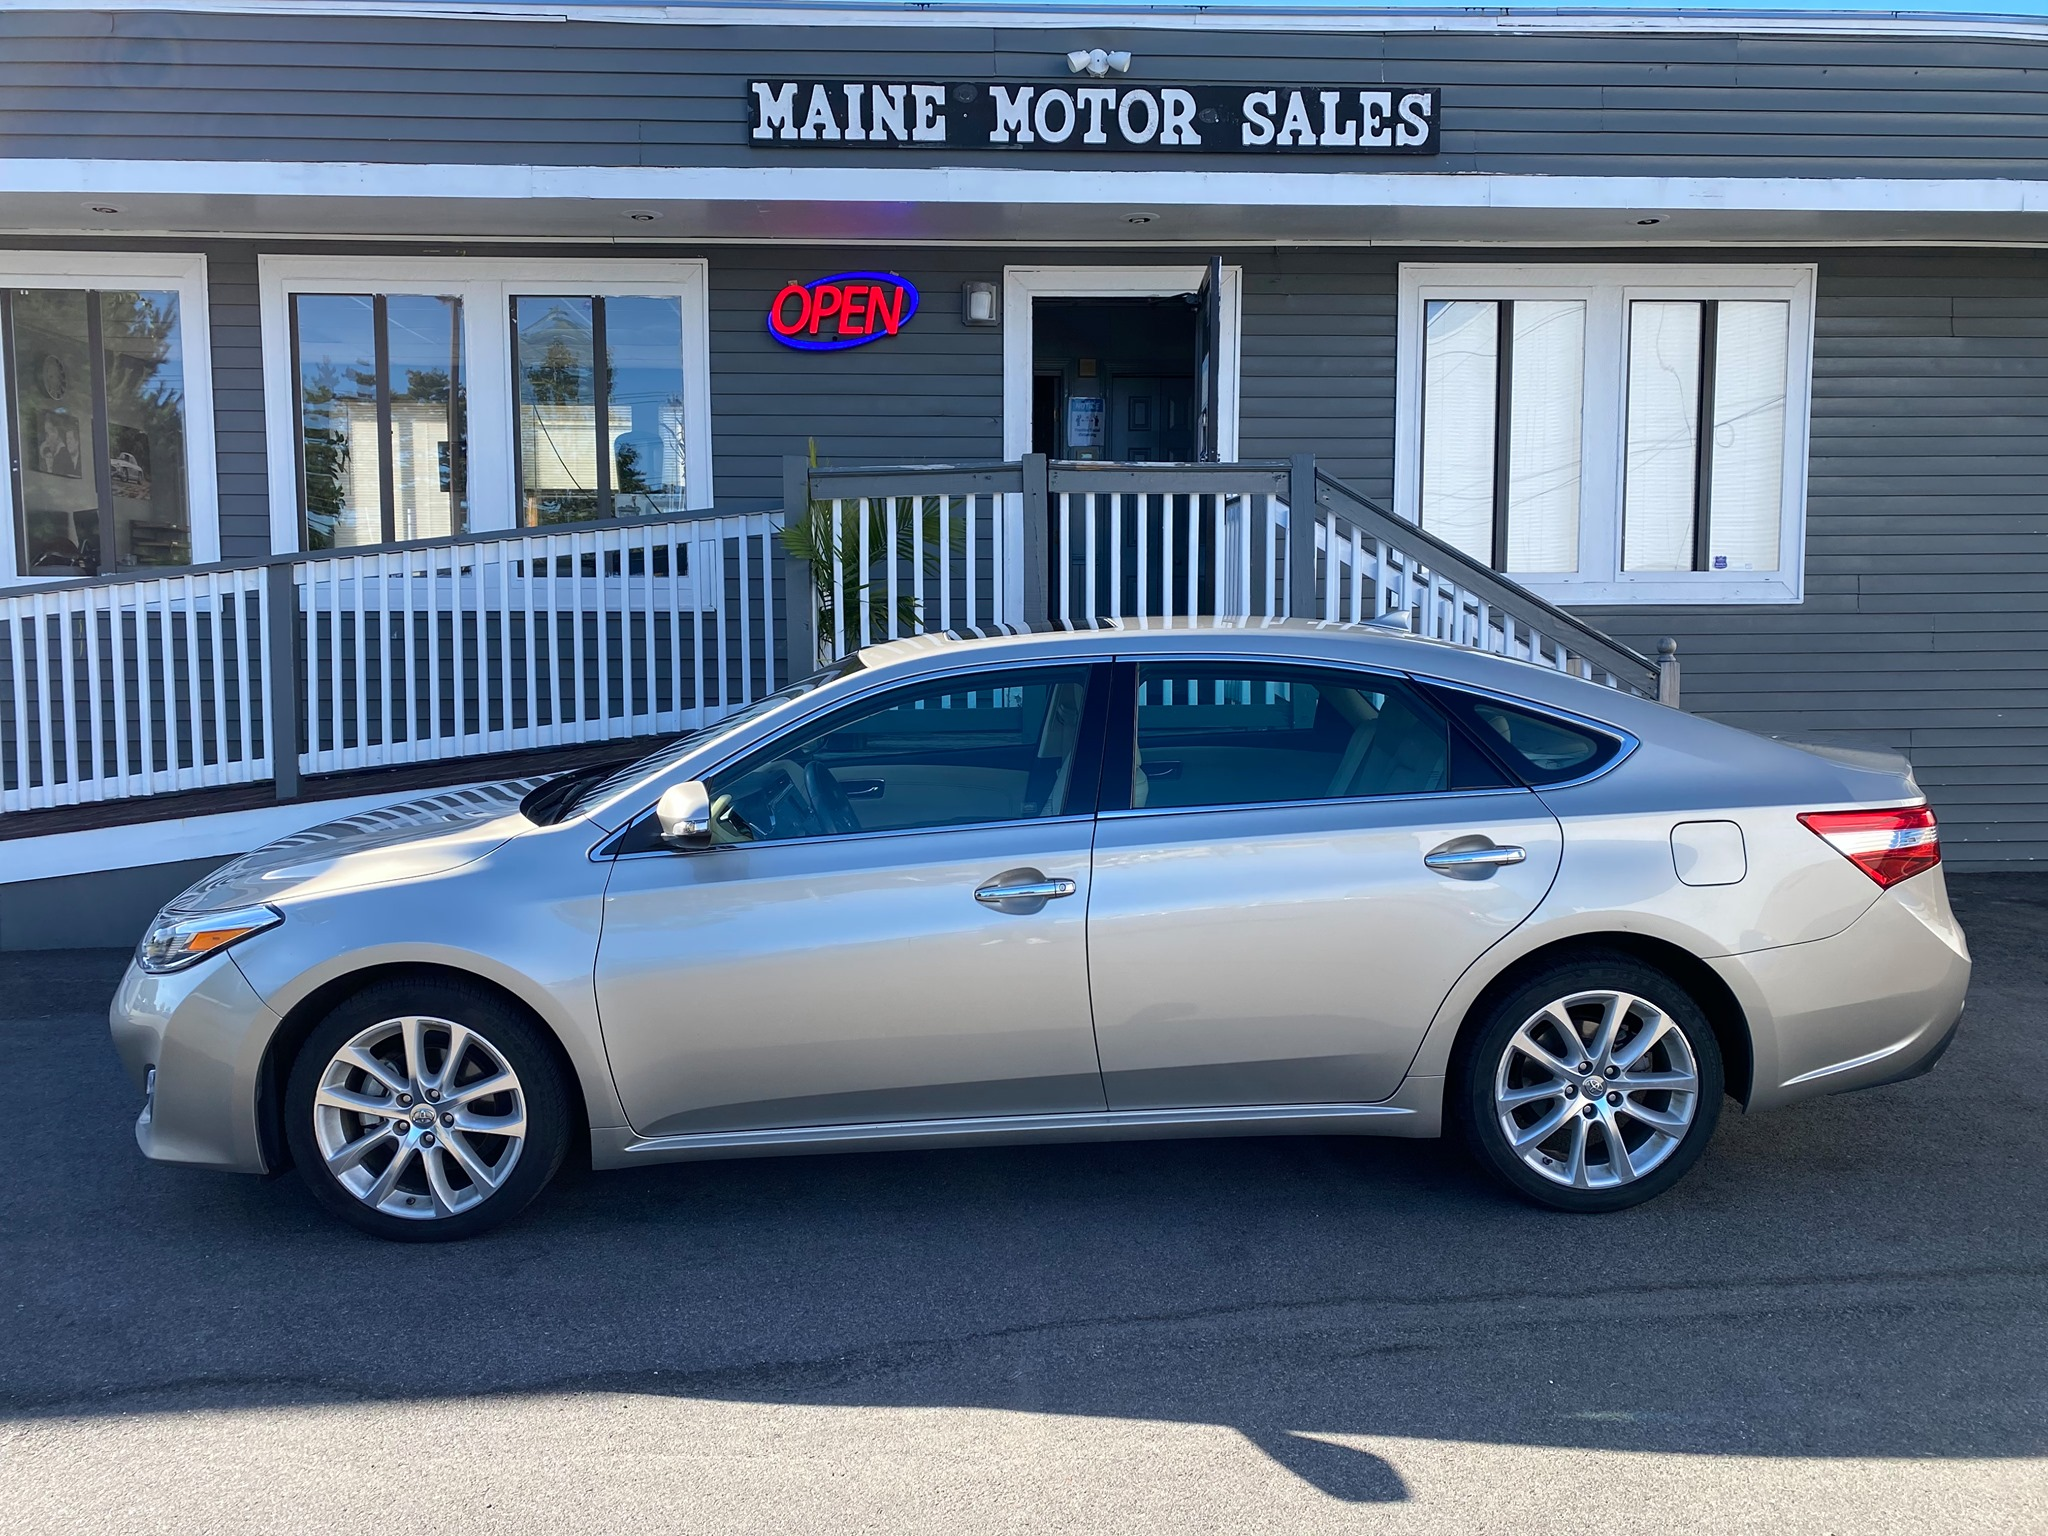 Maine Motor Sales – Car dealership in Portland Maine